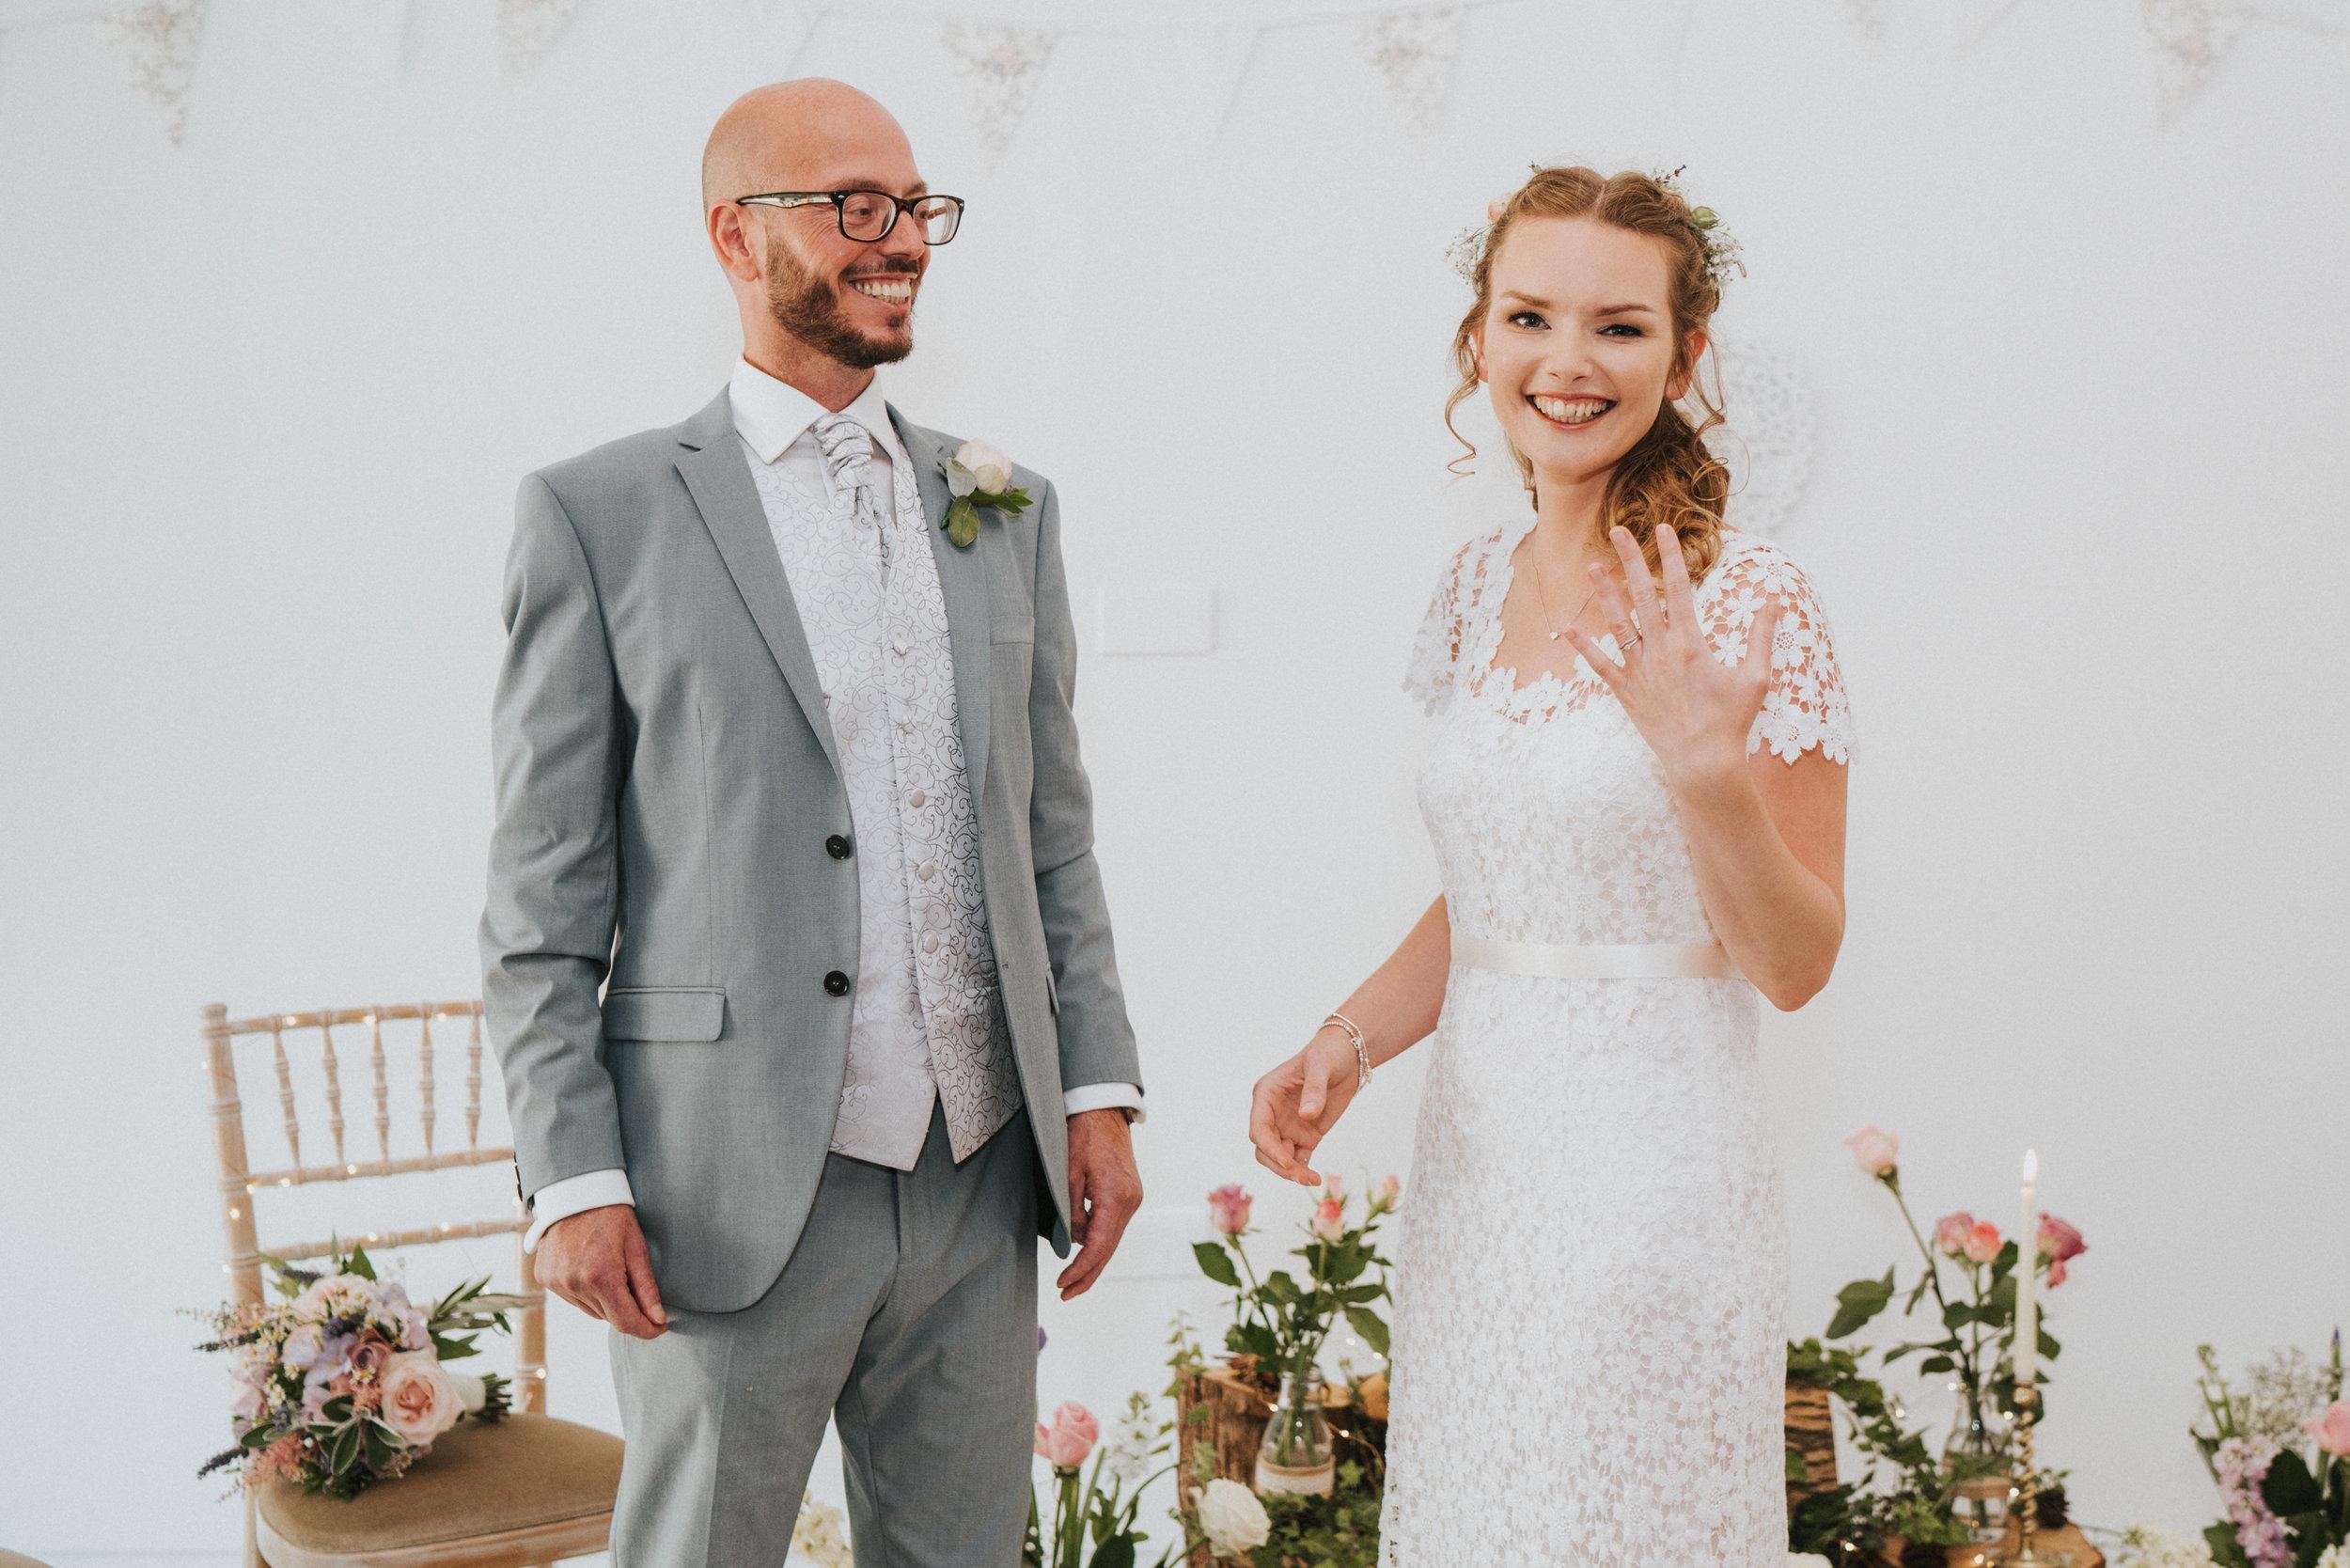 Grace-Elizabeth-Georgie-Amalaketu-Firstsite-Colchester-Essex-Boho-Buddhist-Wedding-Alternative-Wedding-Photography-Essex (61 of 100).jpg